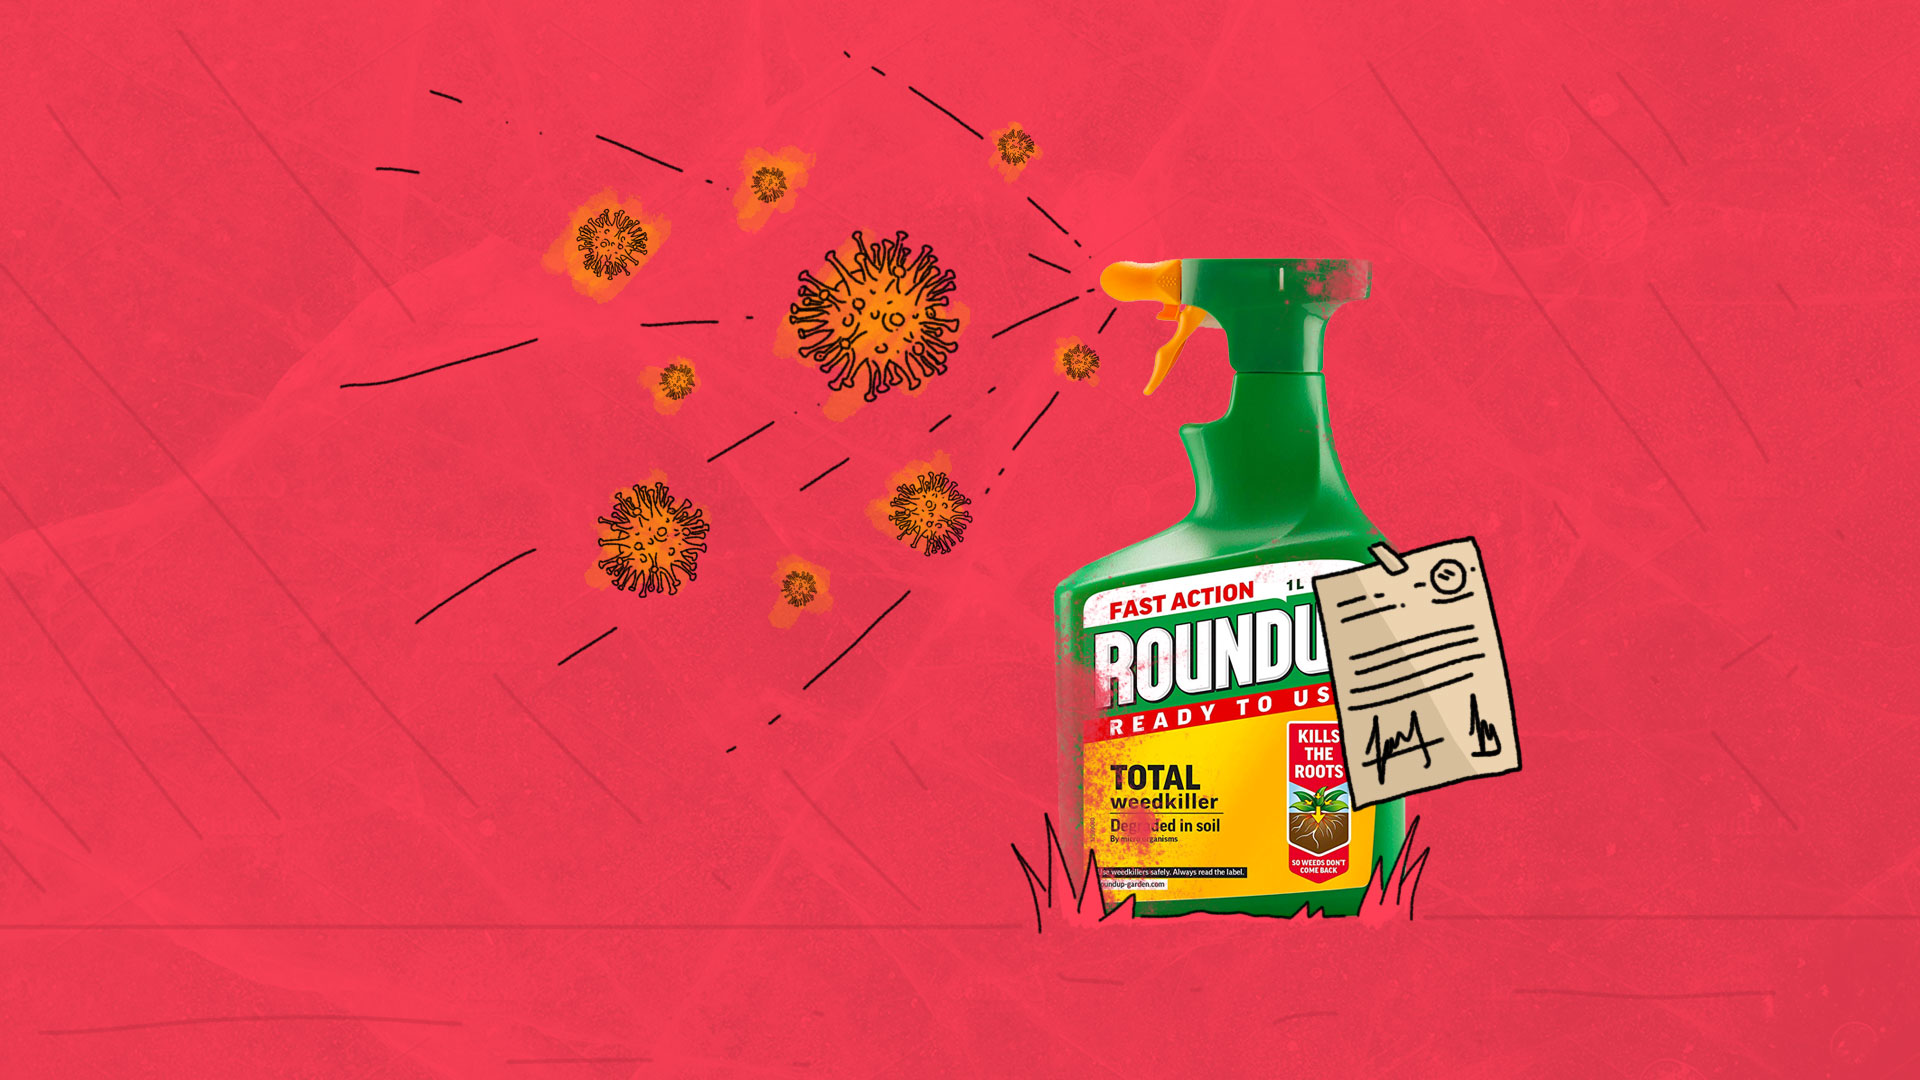 Multa a Monsanto por uso de glifosato: un golpe a la política de drogas de Iván Duque